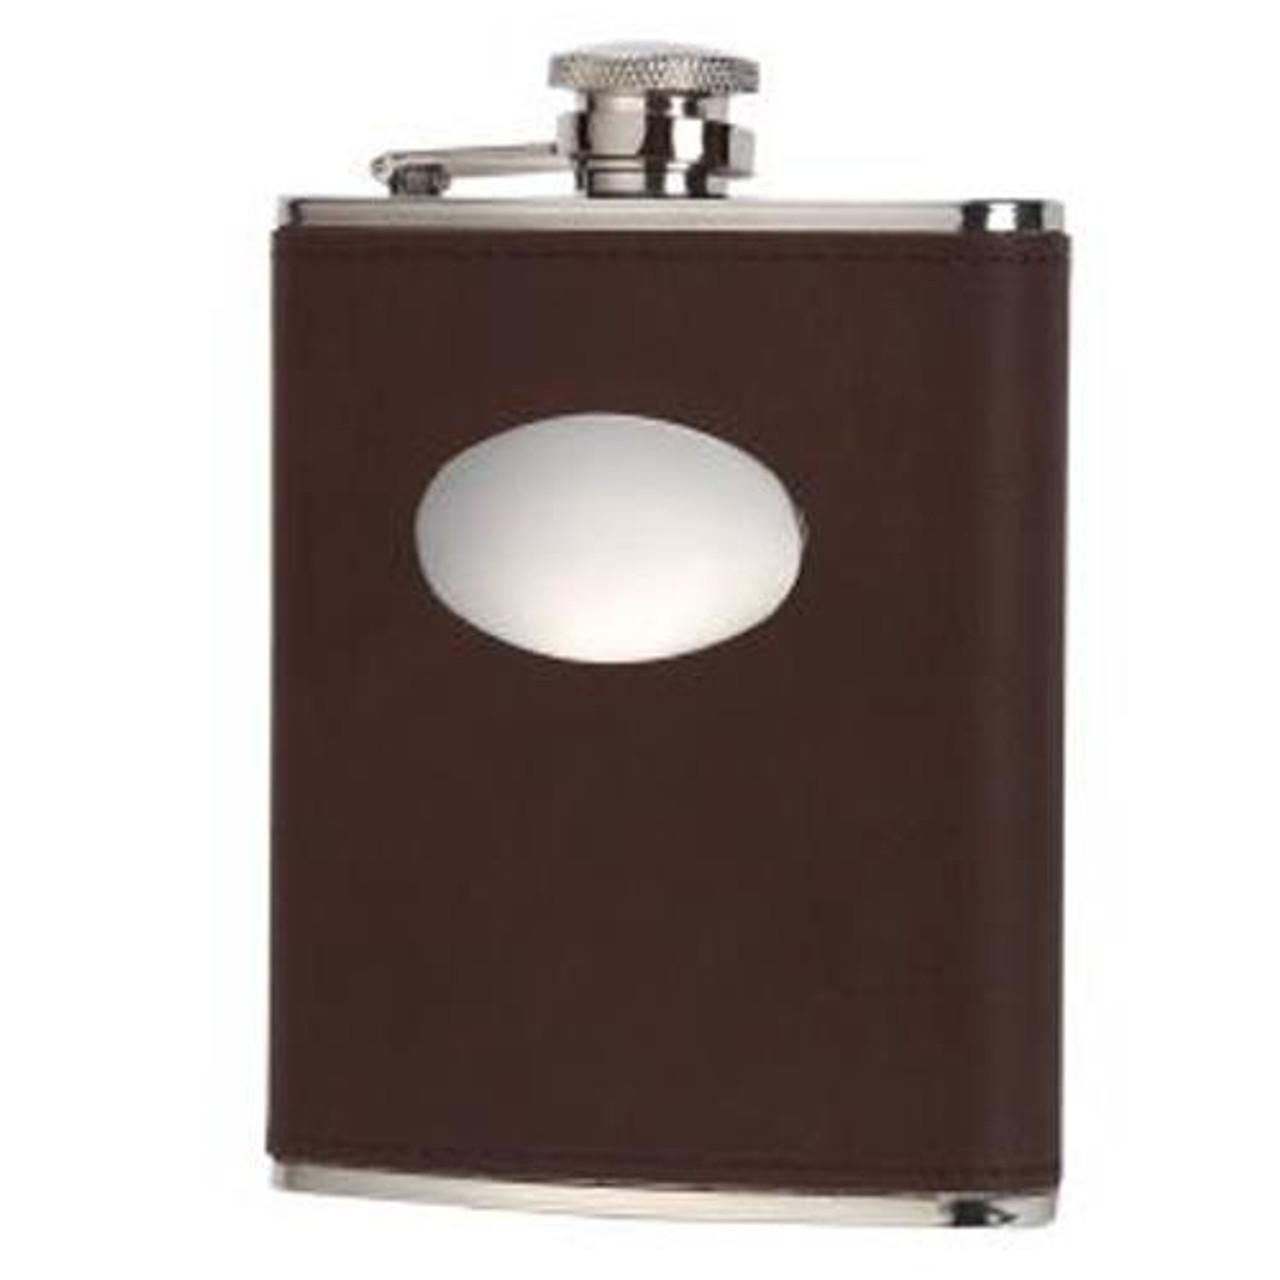 Brown David Nickerson 6oz Hip Flask